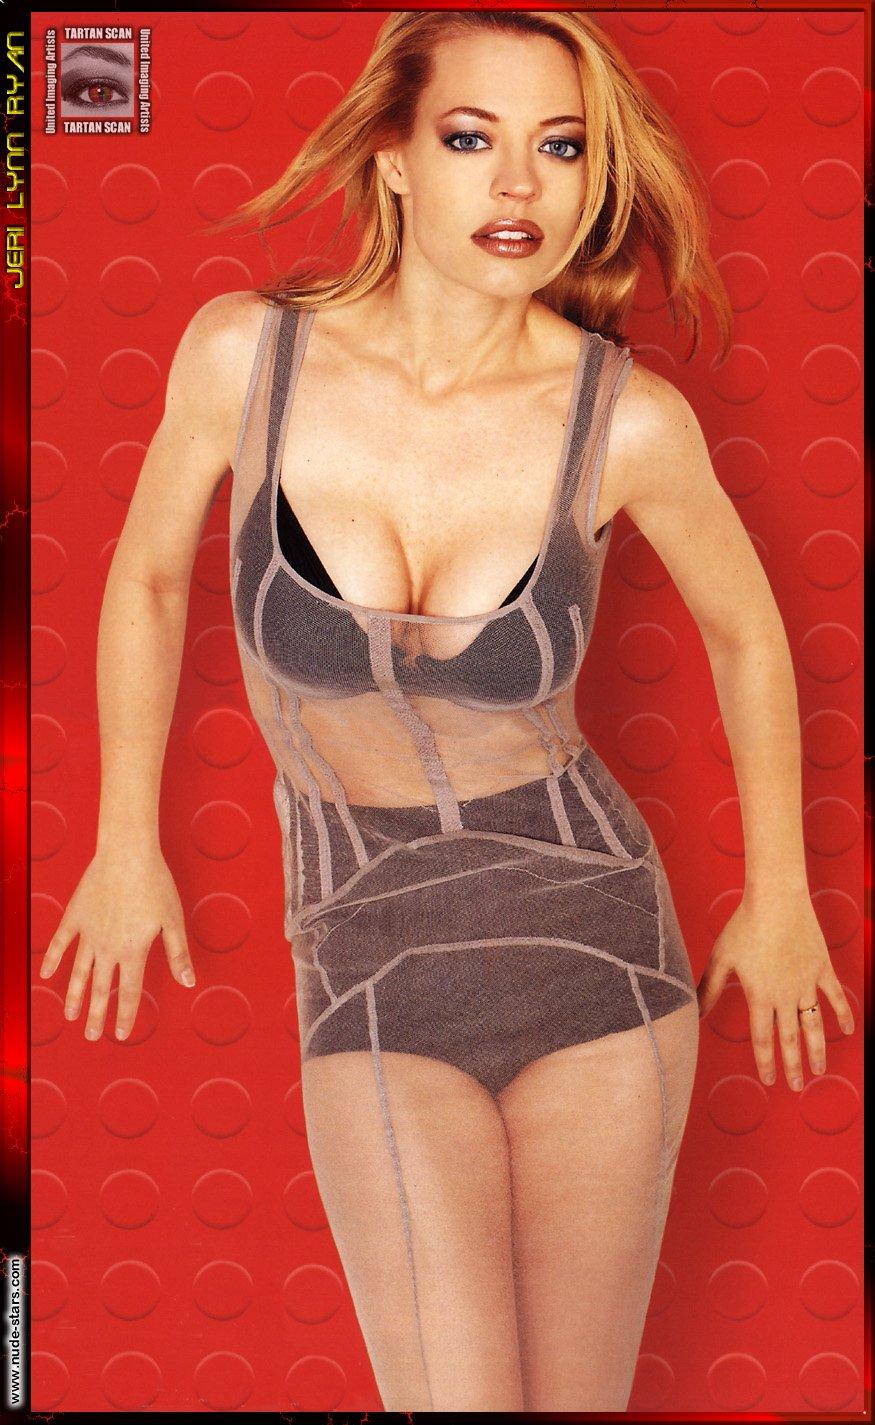 Sonia blade desnuda adult image